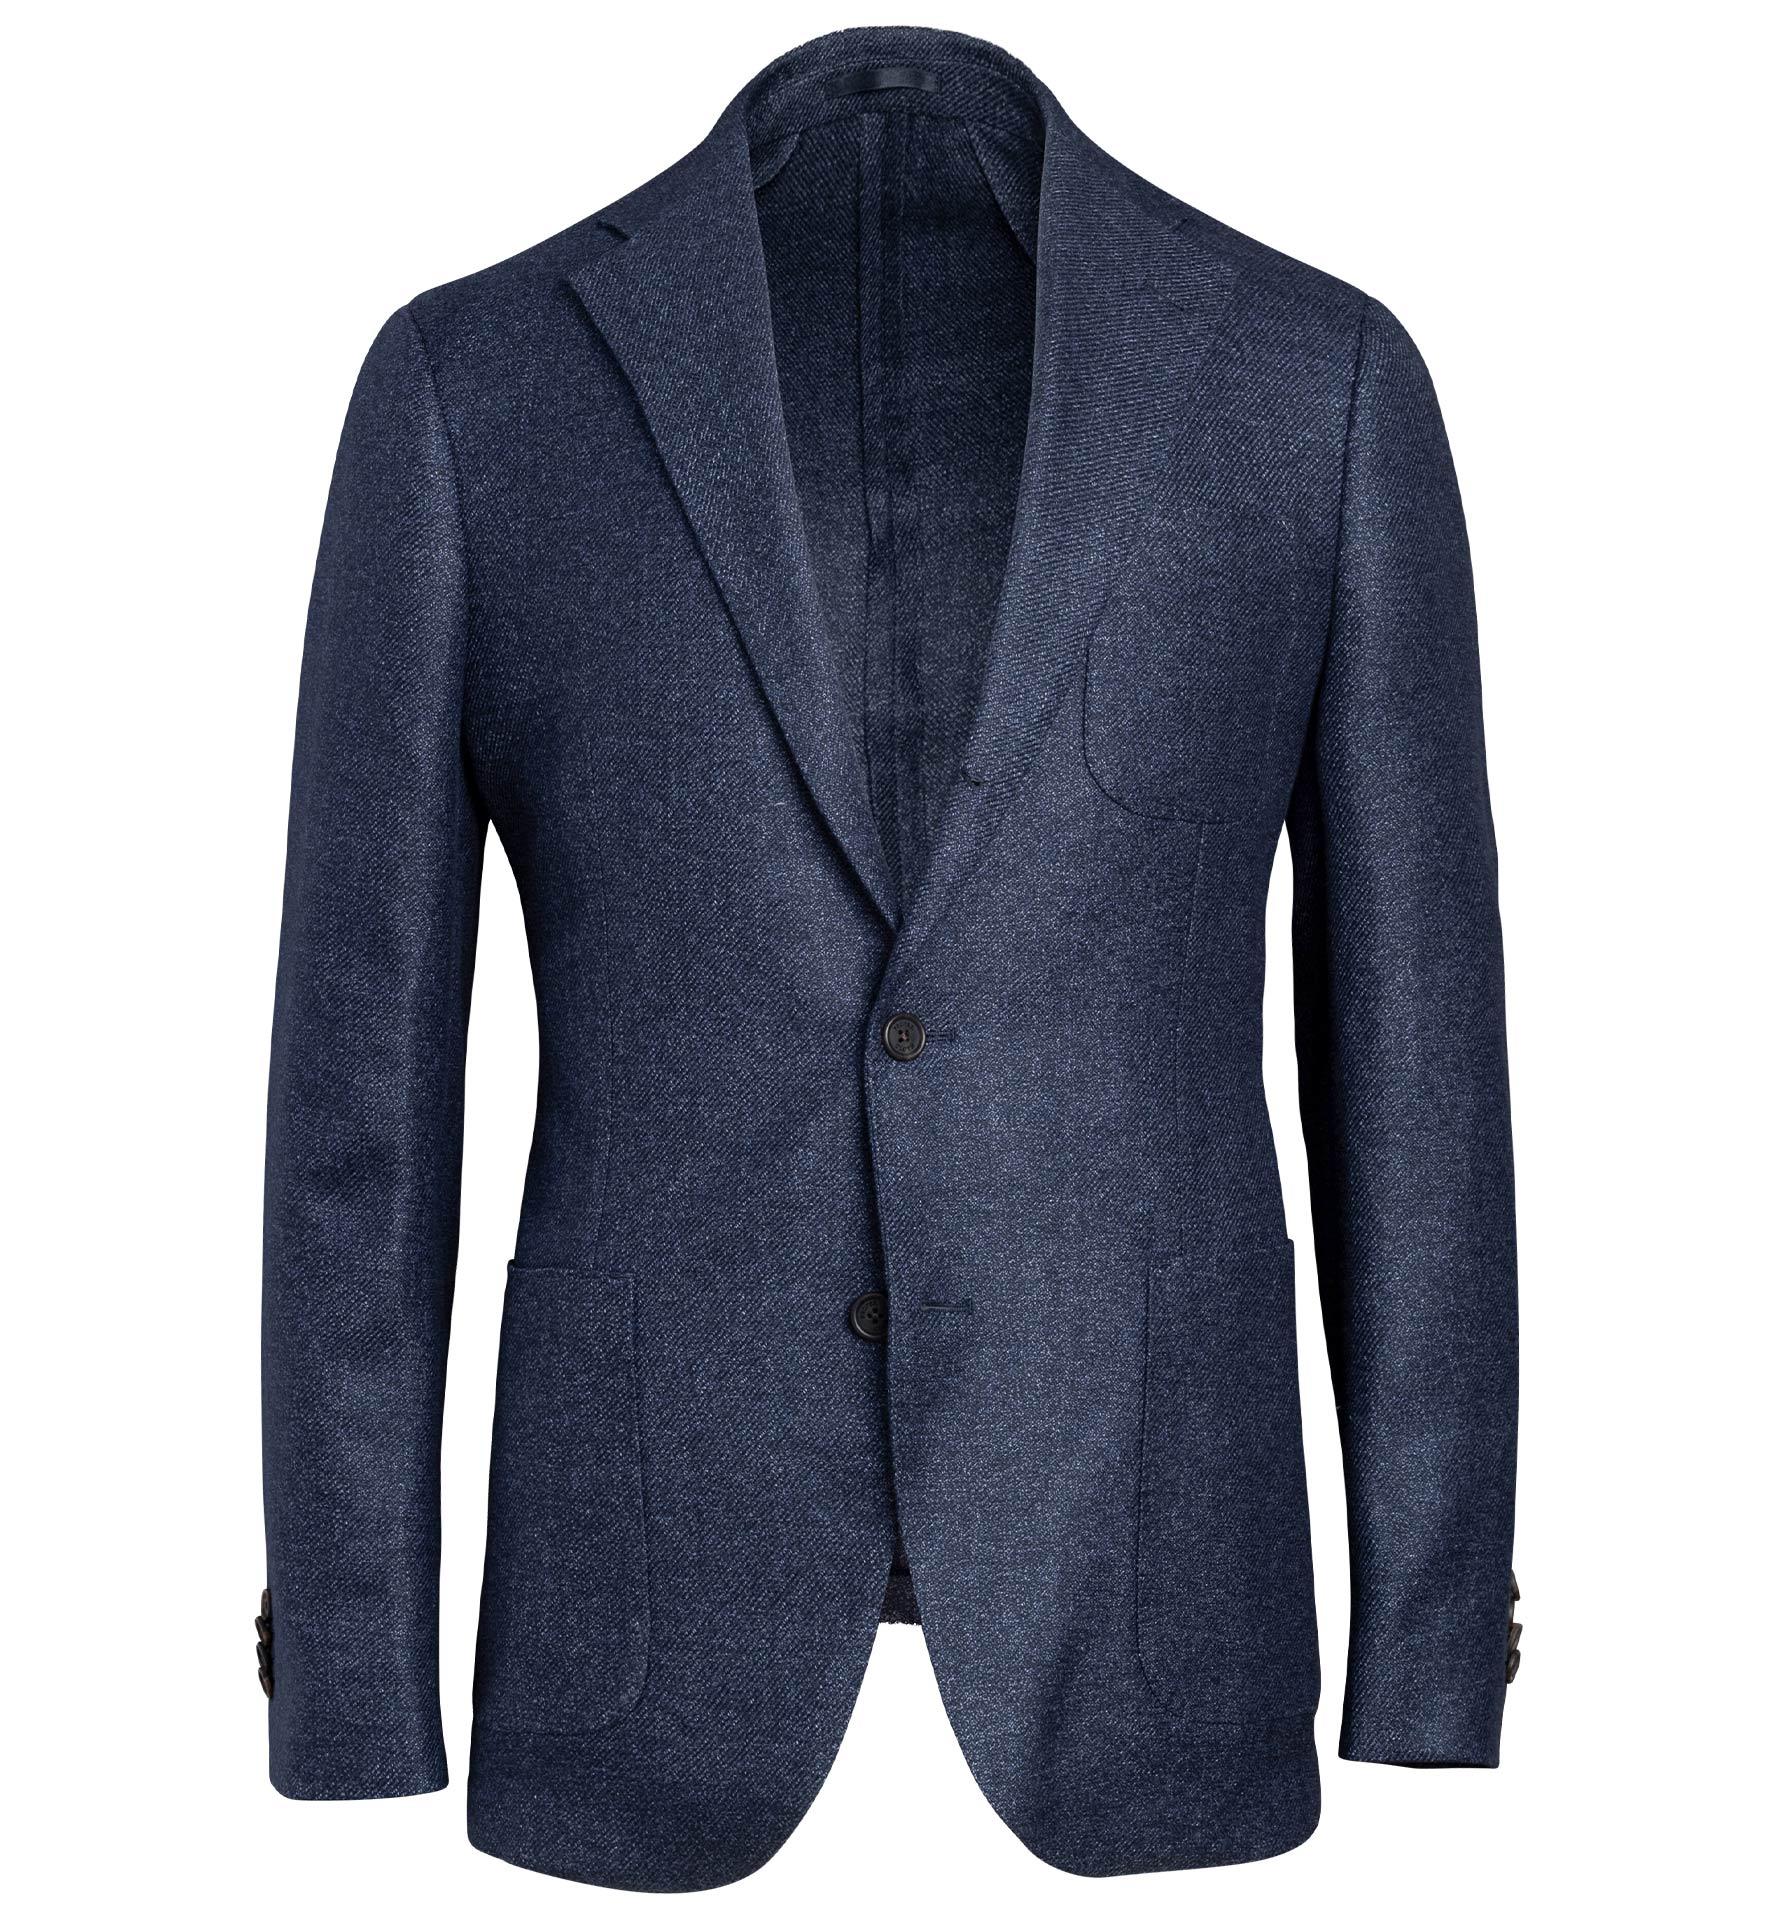 Zoom Image of Bedford Navy Melange Wool and Linen Jacket